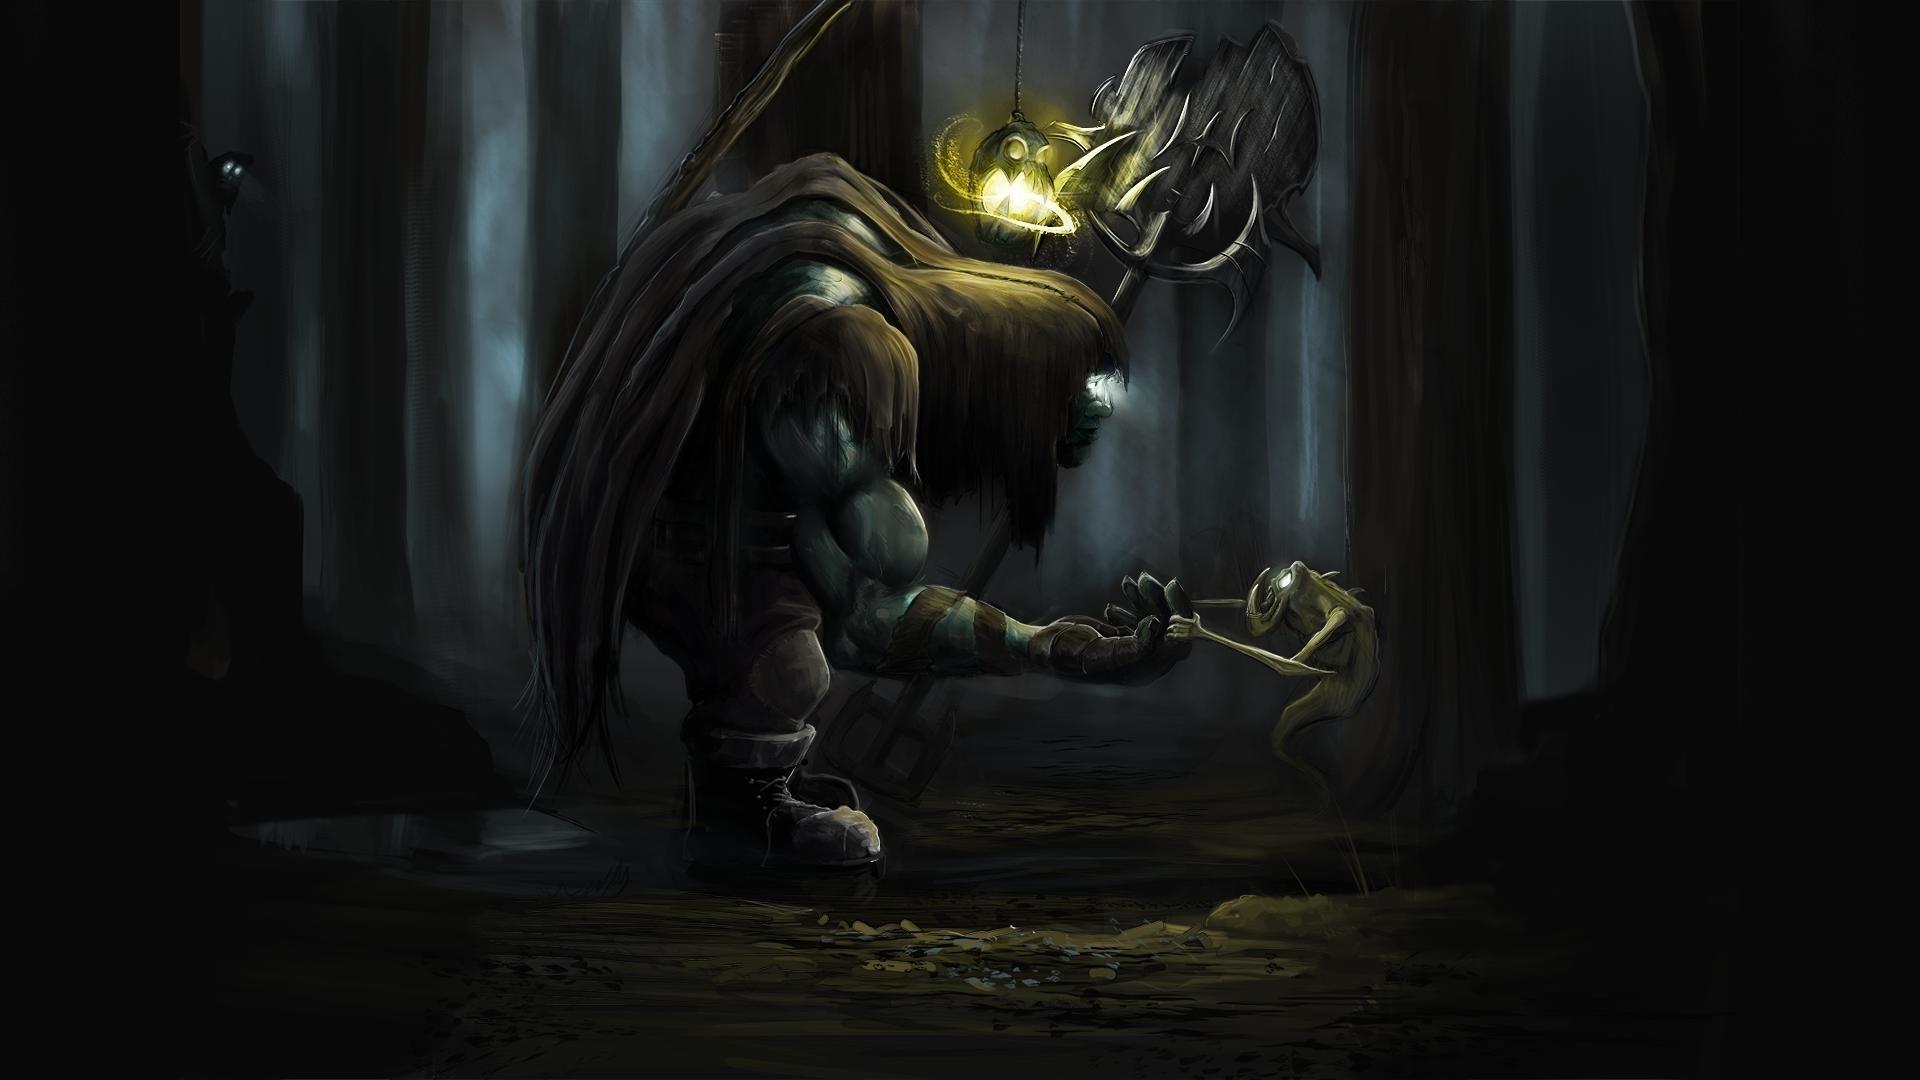 dark creatures   Yorick League of Legends fantasy dark monsters creatures  scary trees … Desktop WallpapersHd …